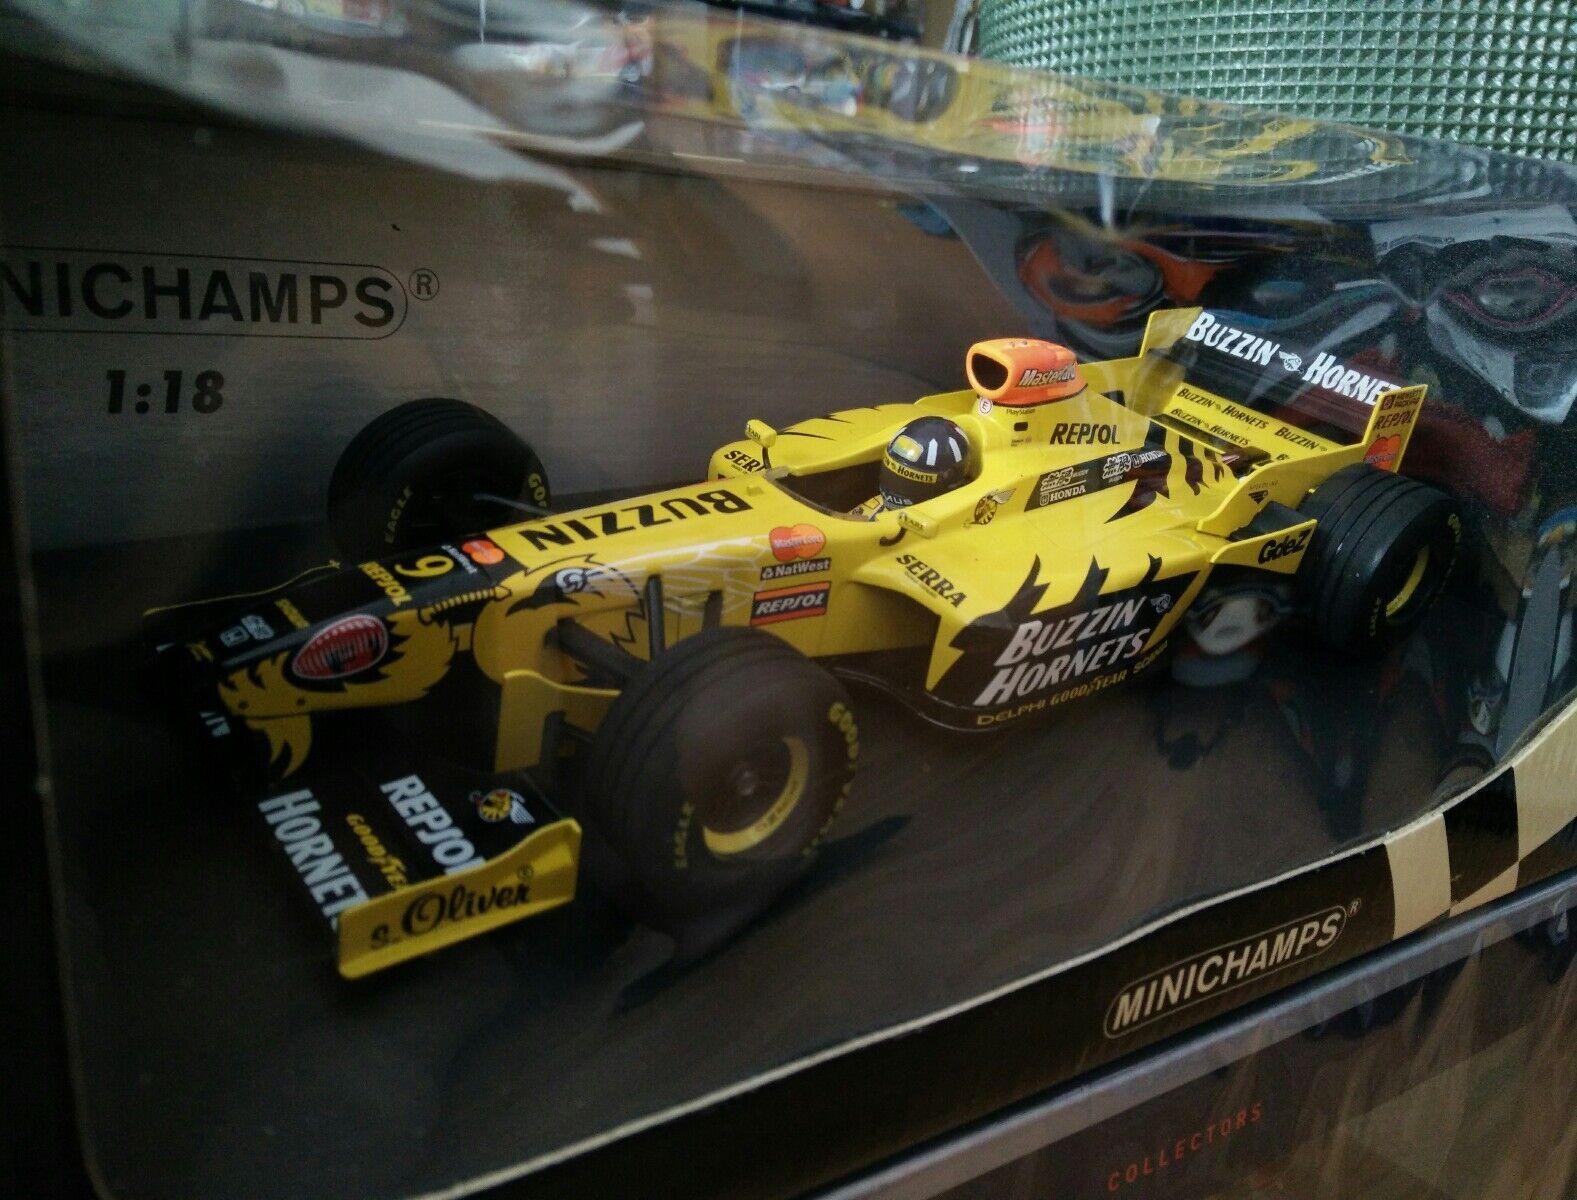 Damon Hill Jordan Mugen Honda 198 Minichamps  1 18